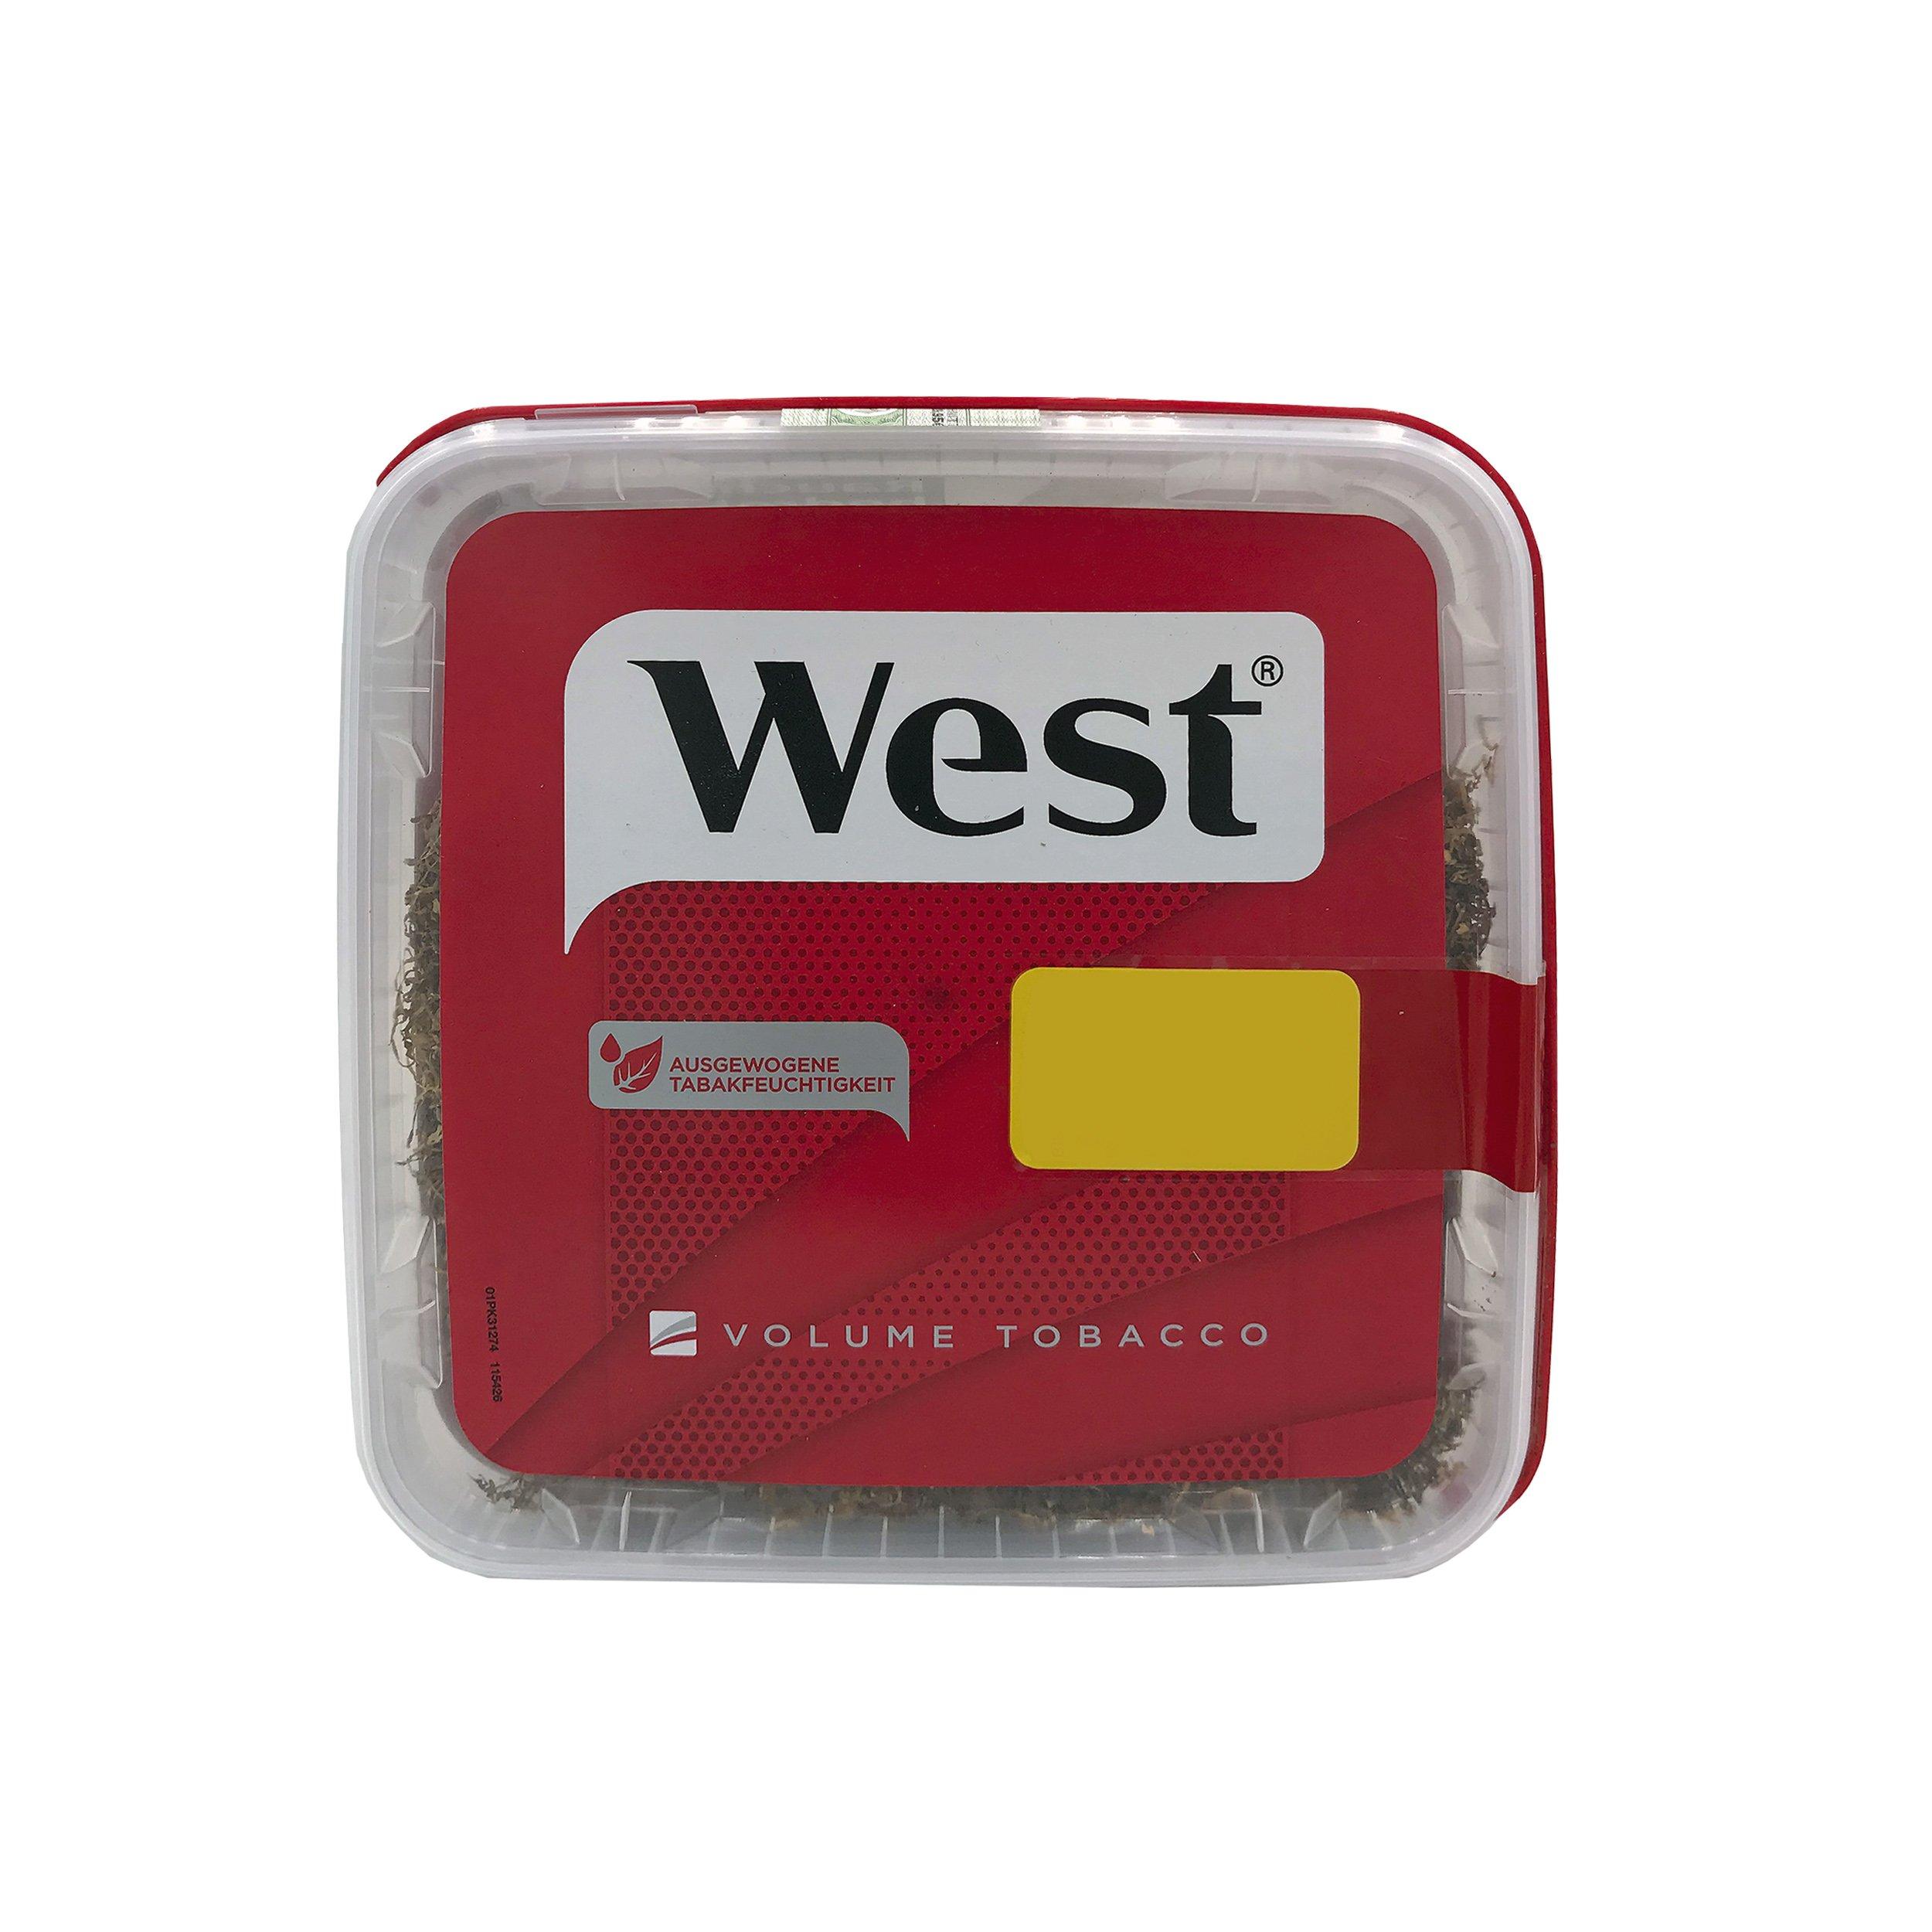 2 x West Red Tabak /Volumentabak Mega Box 280 g, 1000 West Extra Hülsen, Feuerzeuge